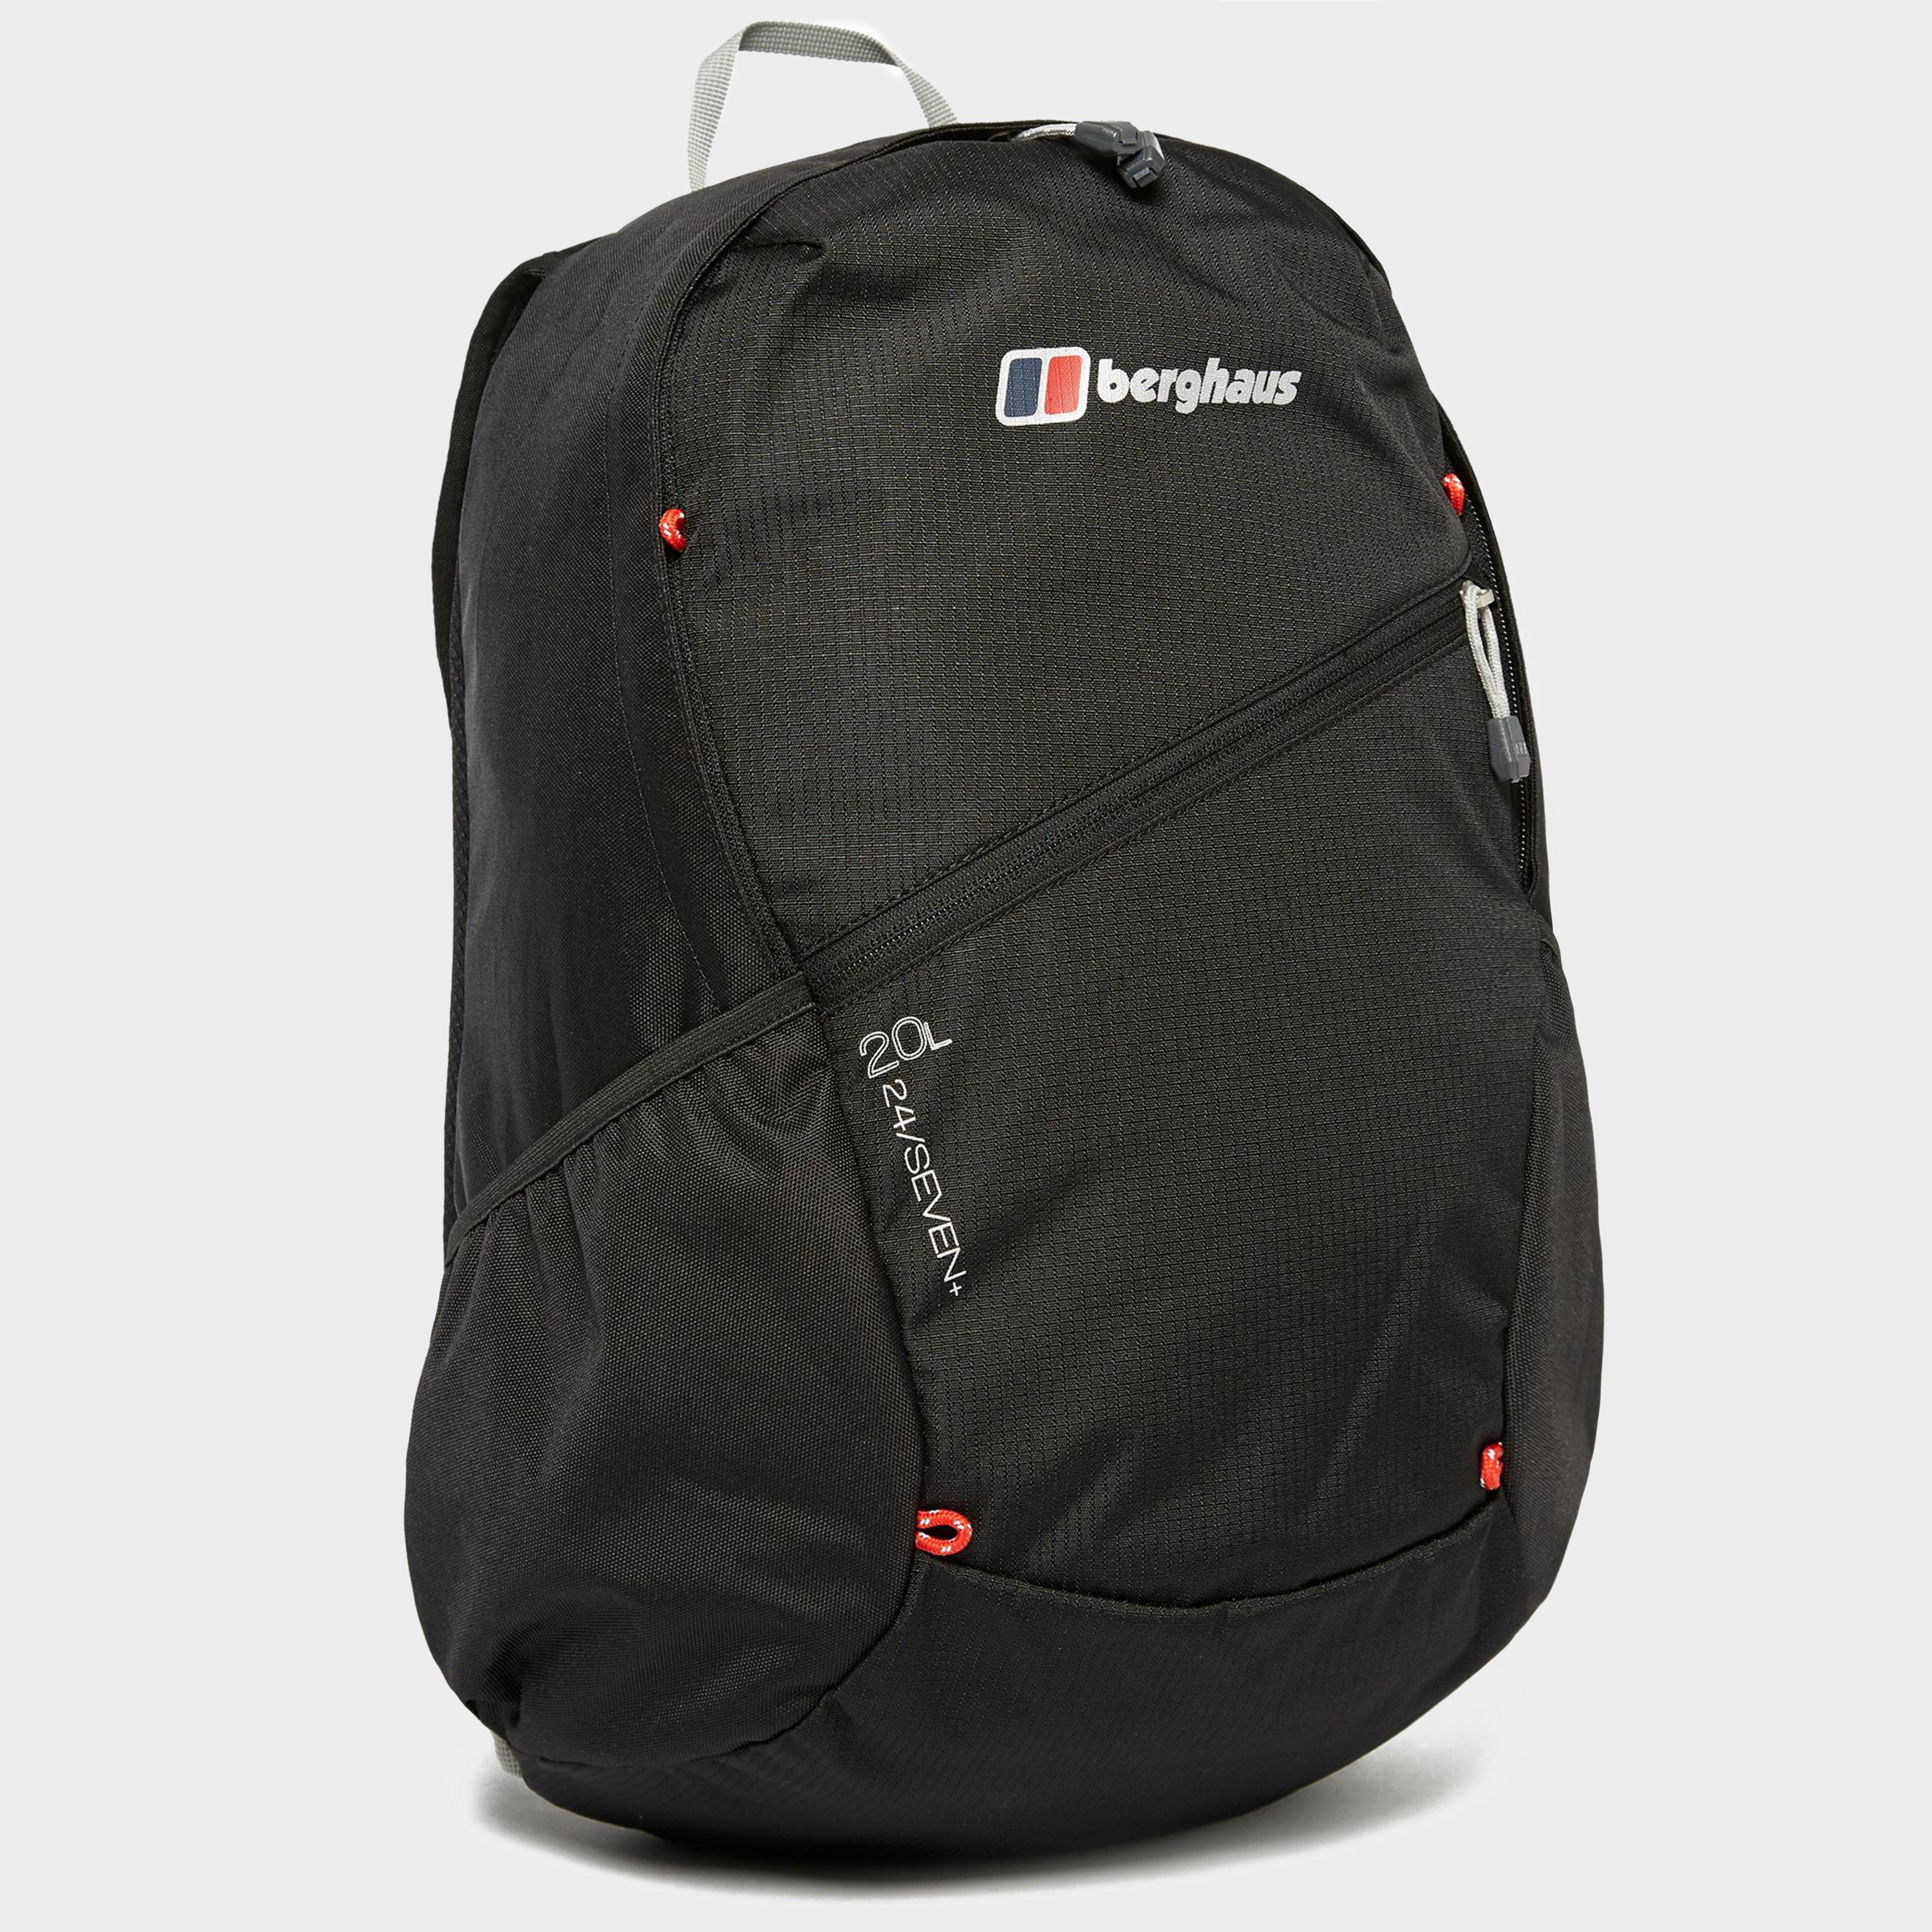 Berghaus 24/7 20l Daysack, Black